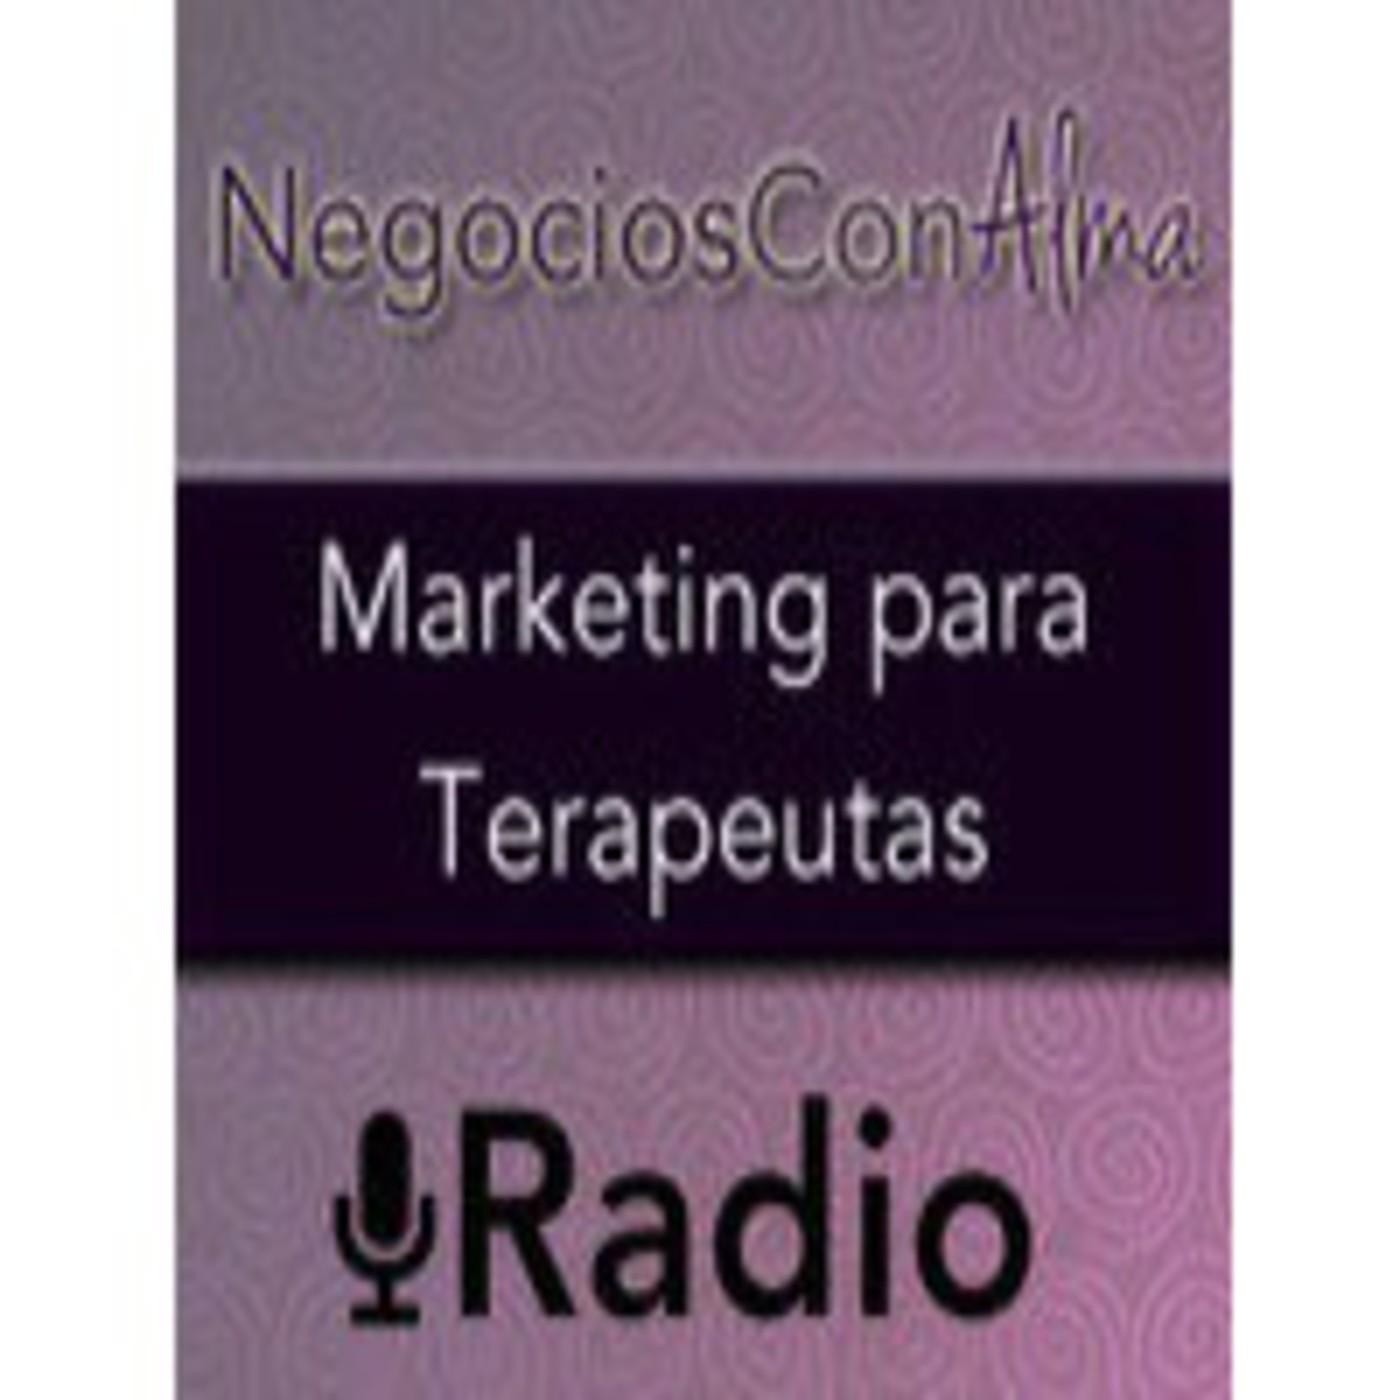 <![CDATA[Marketing para Terapeutas]]>